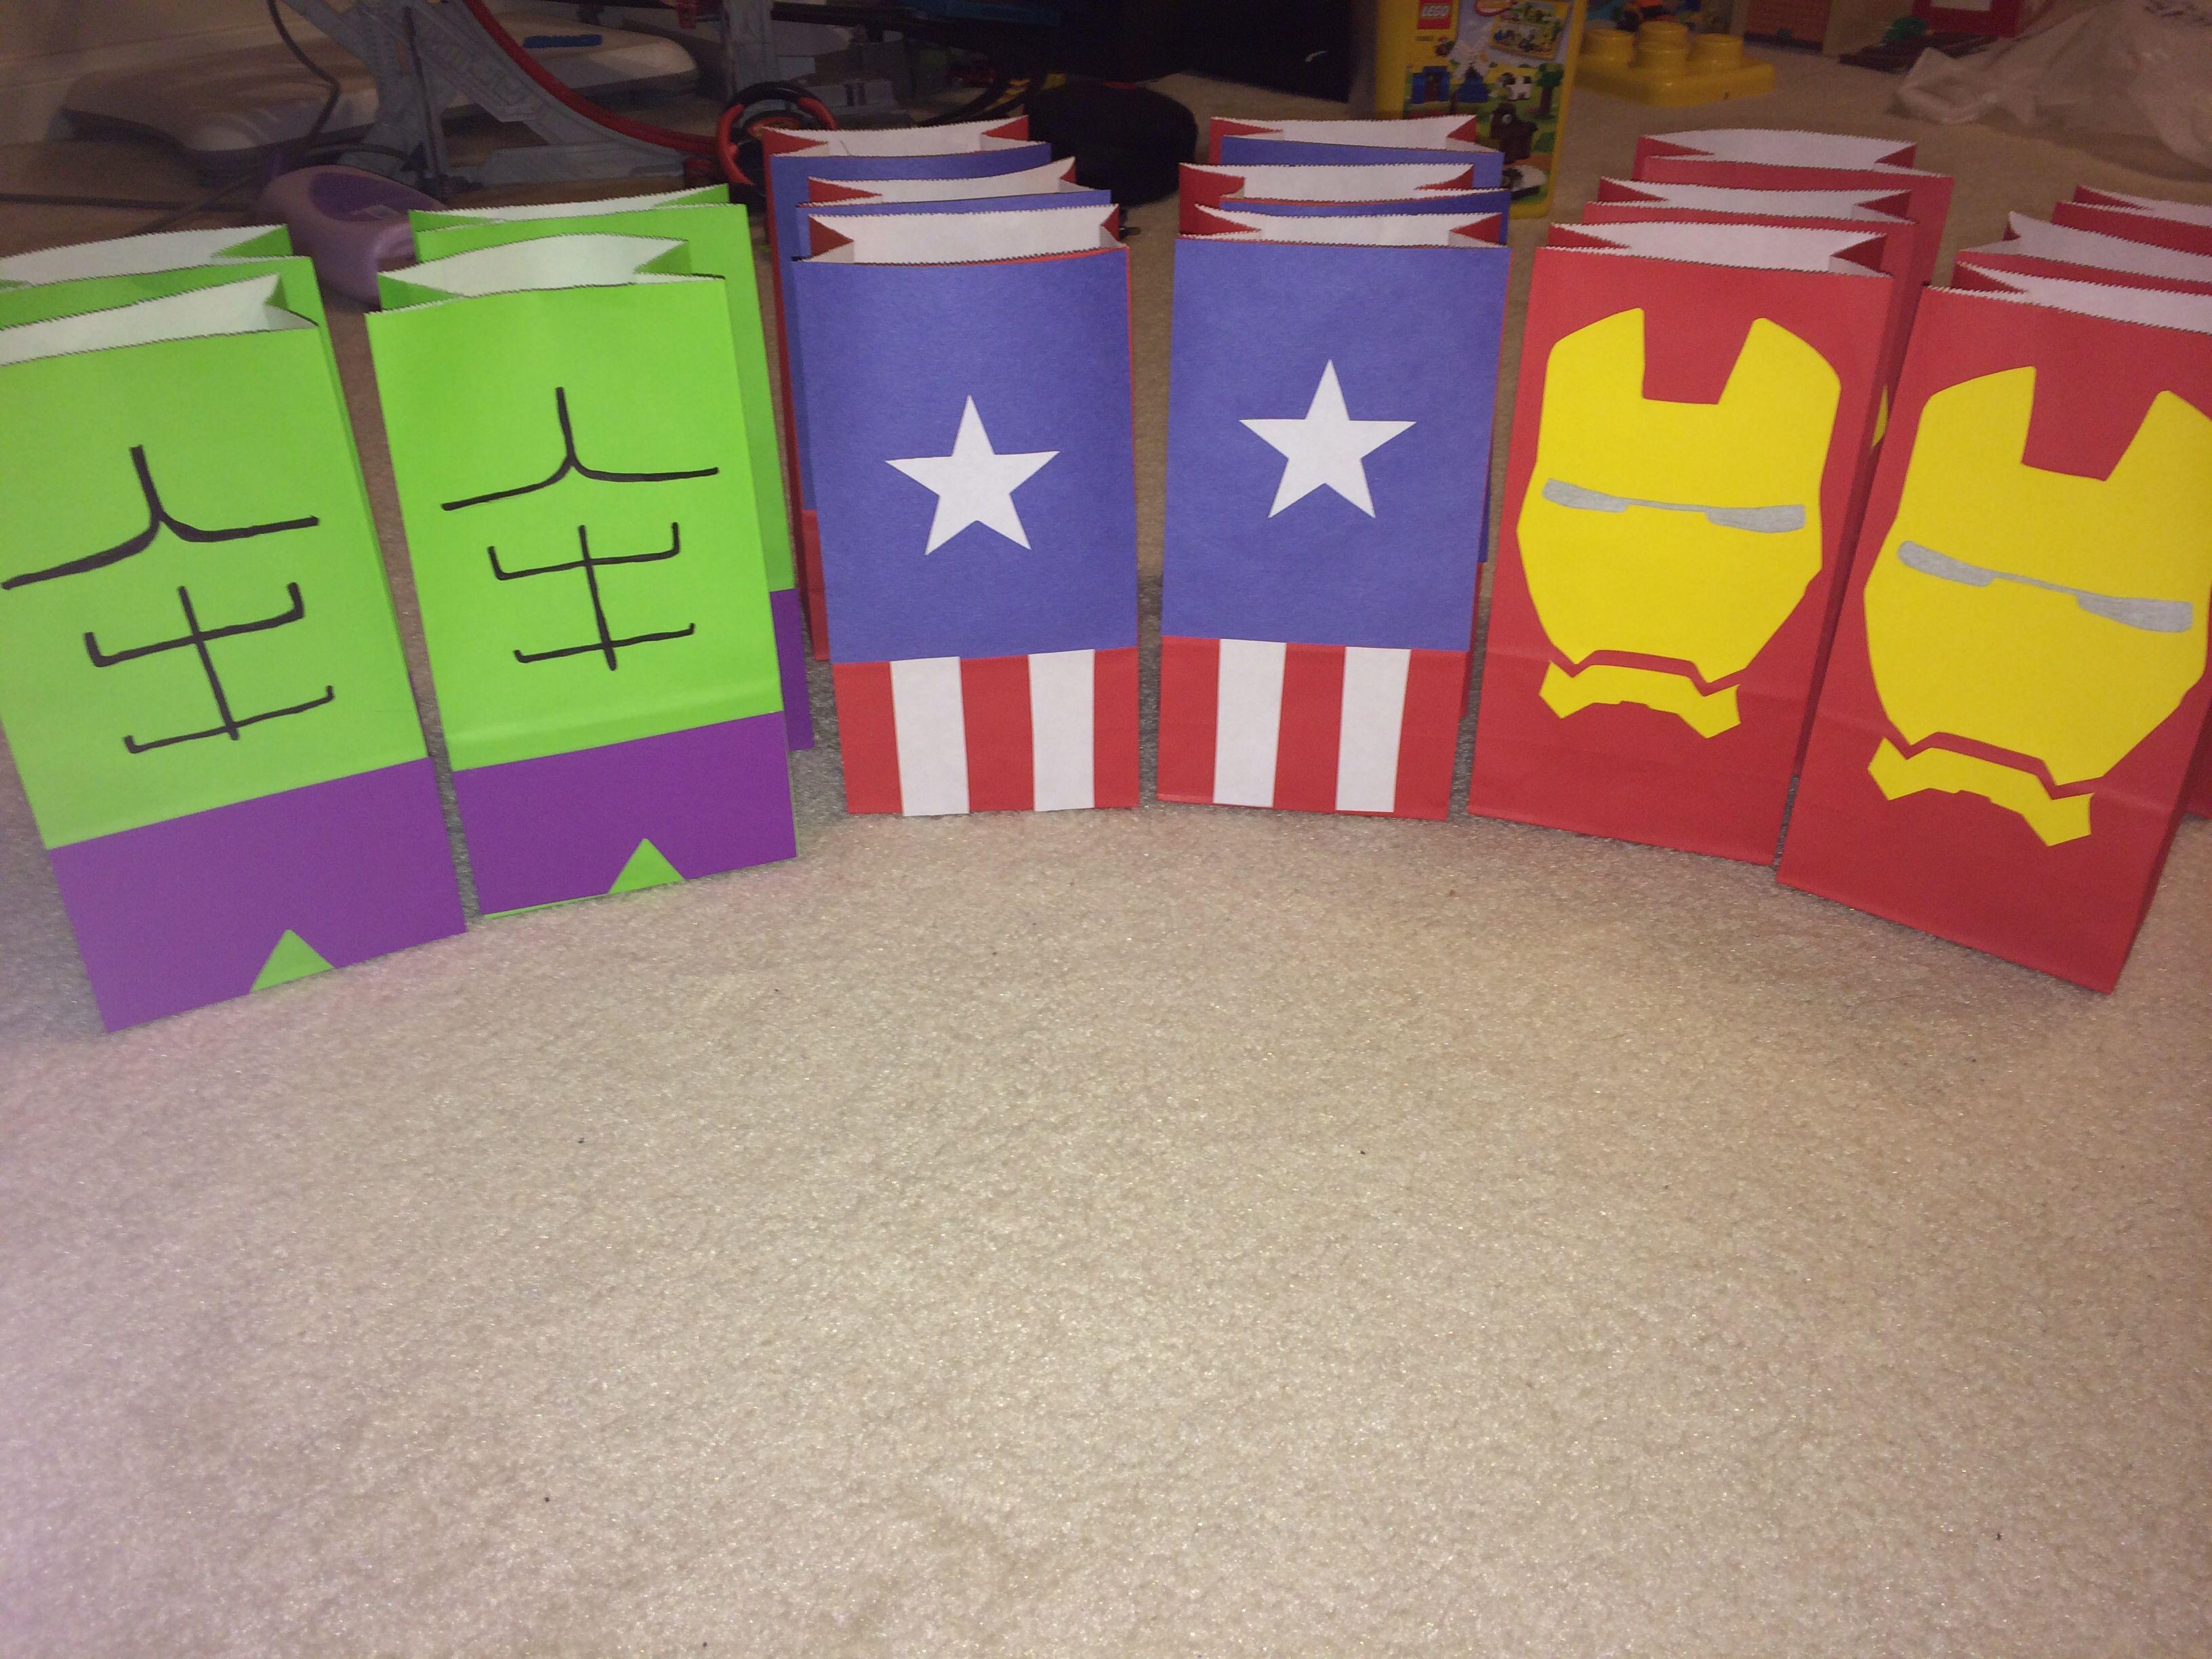 Avengers party favor bags my diys pinterest favor - Bolsas para flash ...